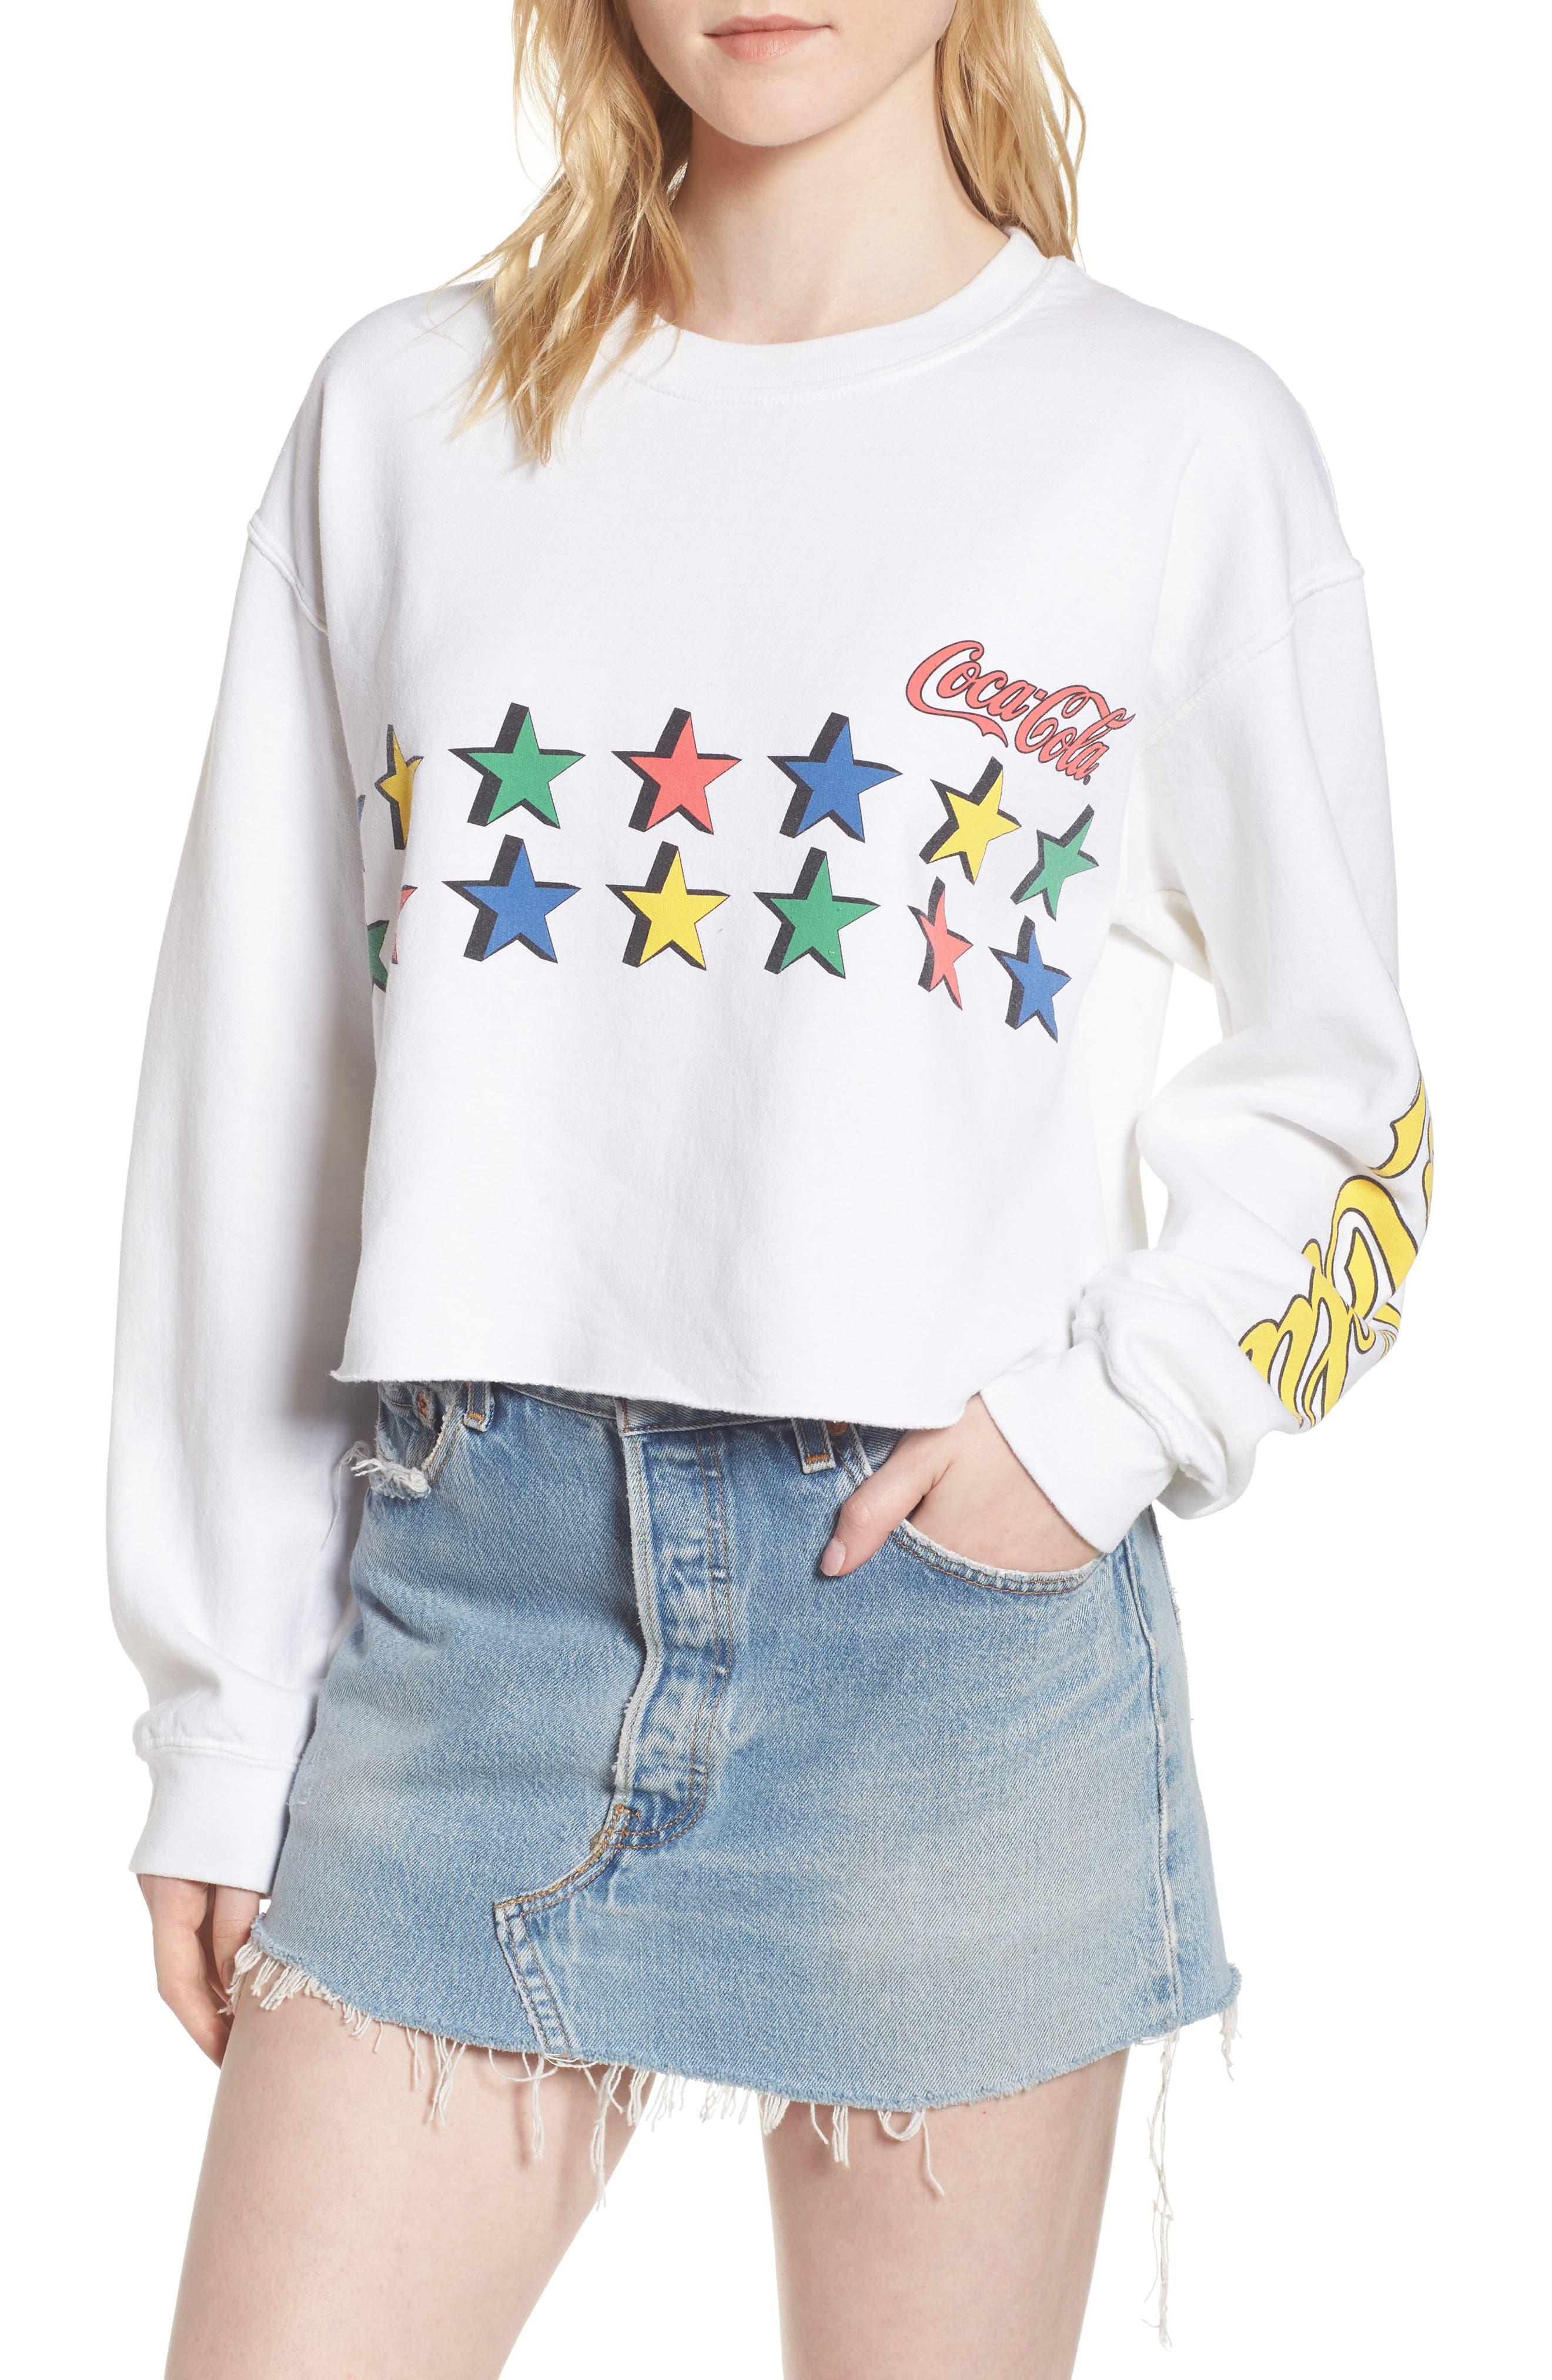 Coke Stars Crop Sweatshirt,                         Main,                         color,